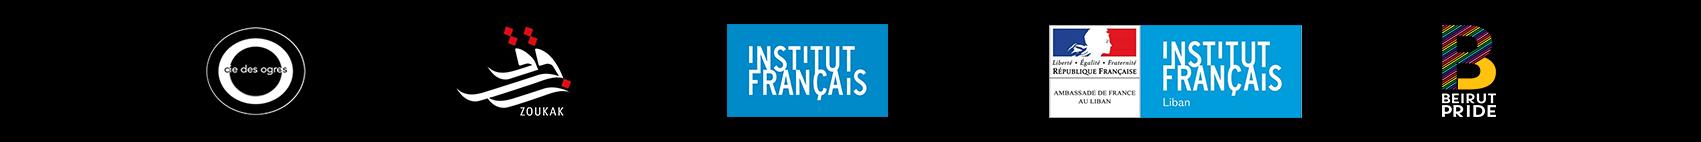 Bannière-logos-Ogres.png